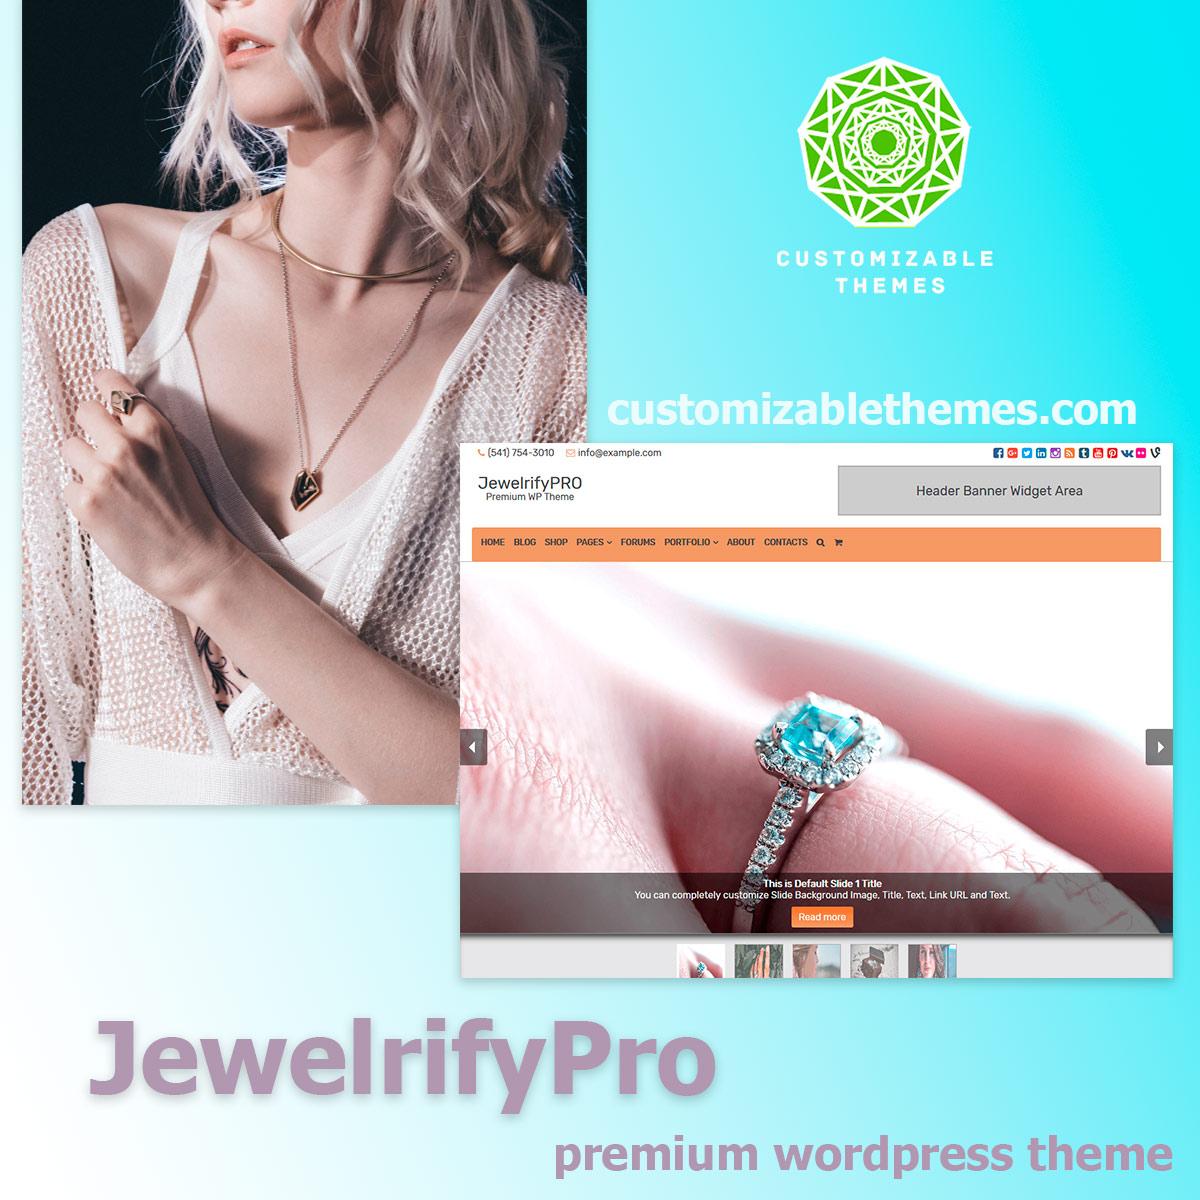 JewelrifyPro---premium---wordpress--theme-customizablethemes